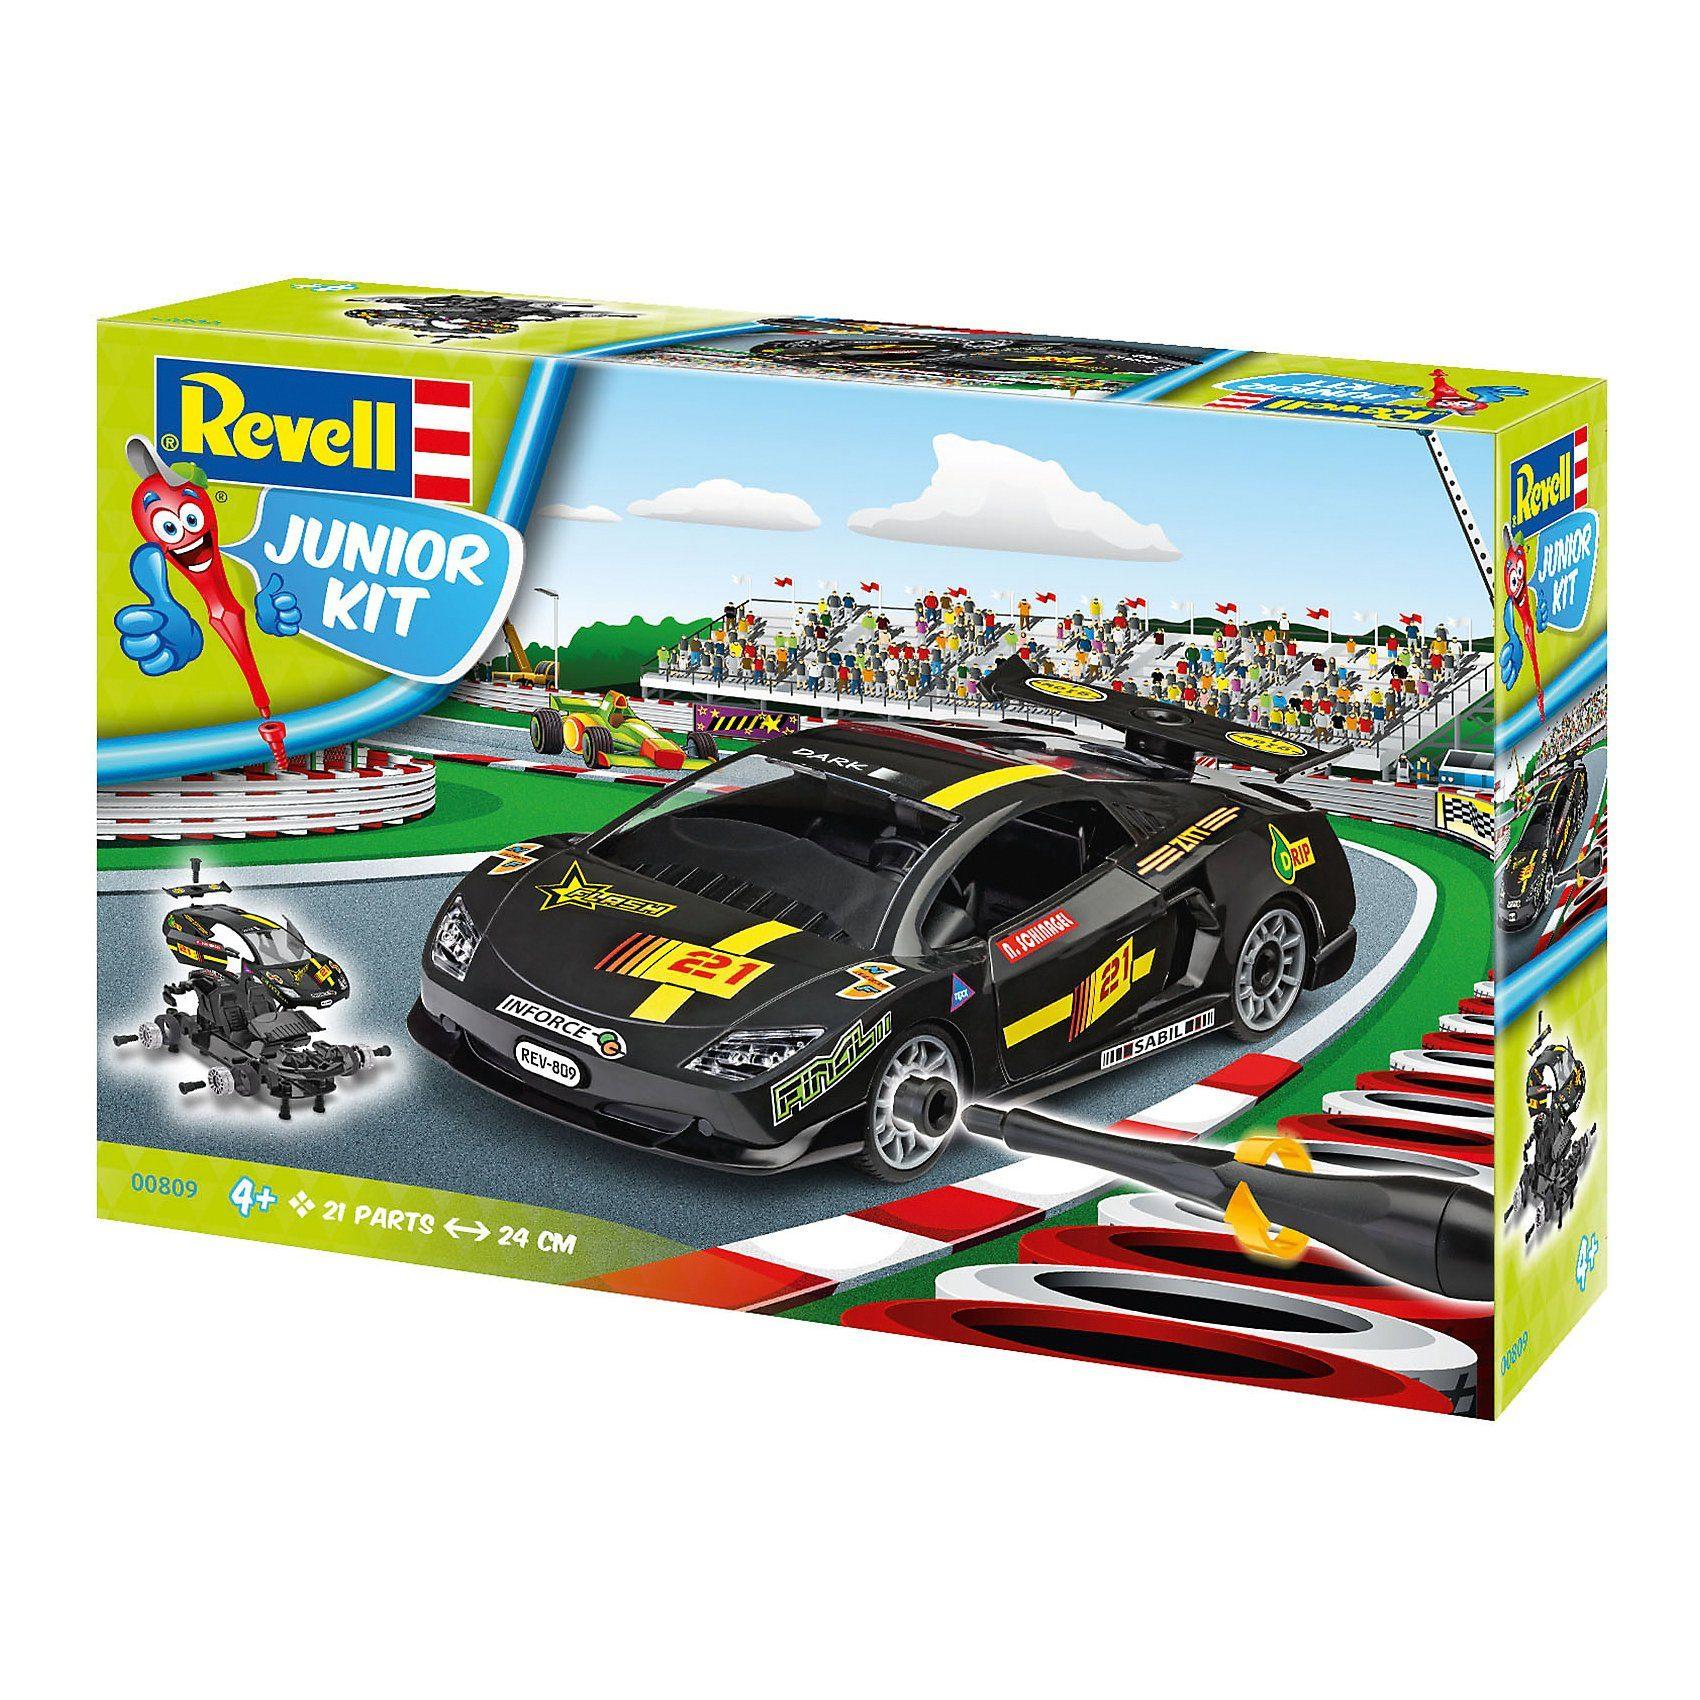 Revell® Junior Kit - Rennwagen schwarz